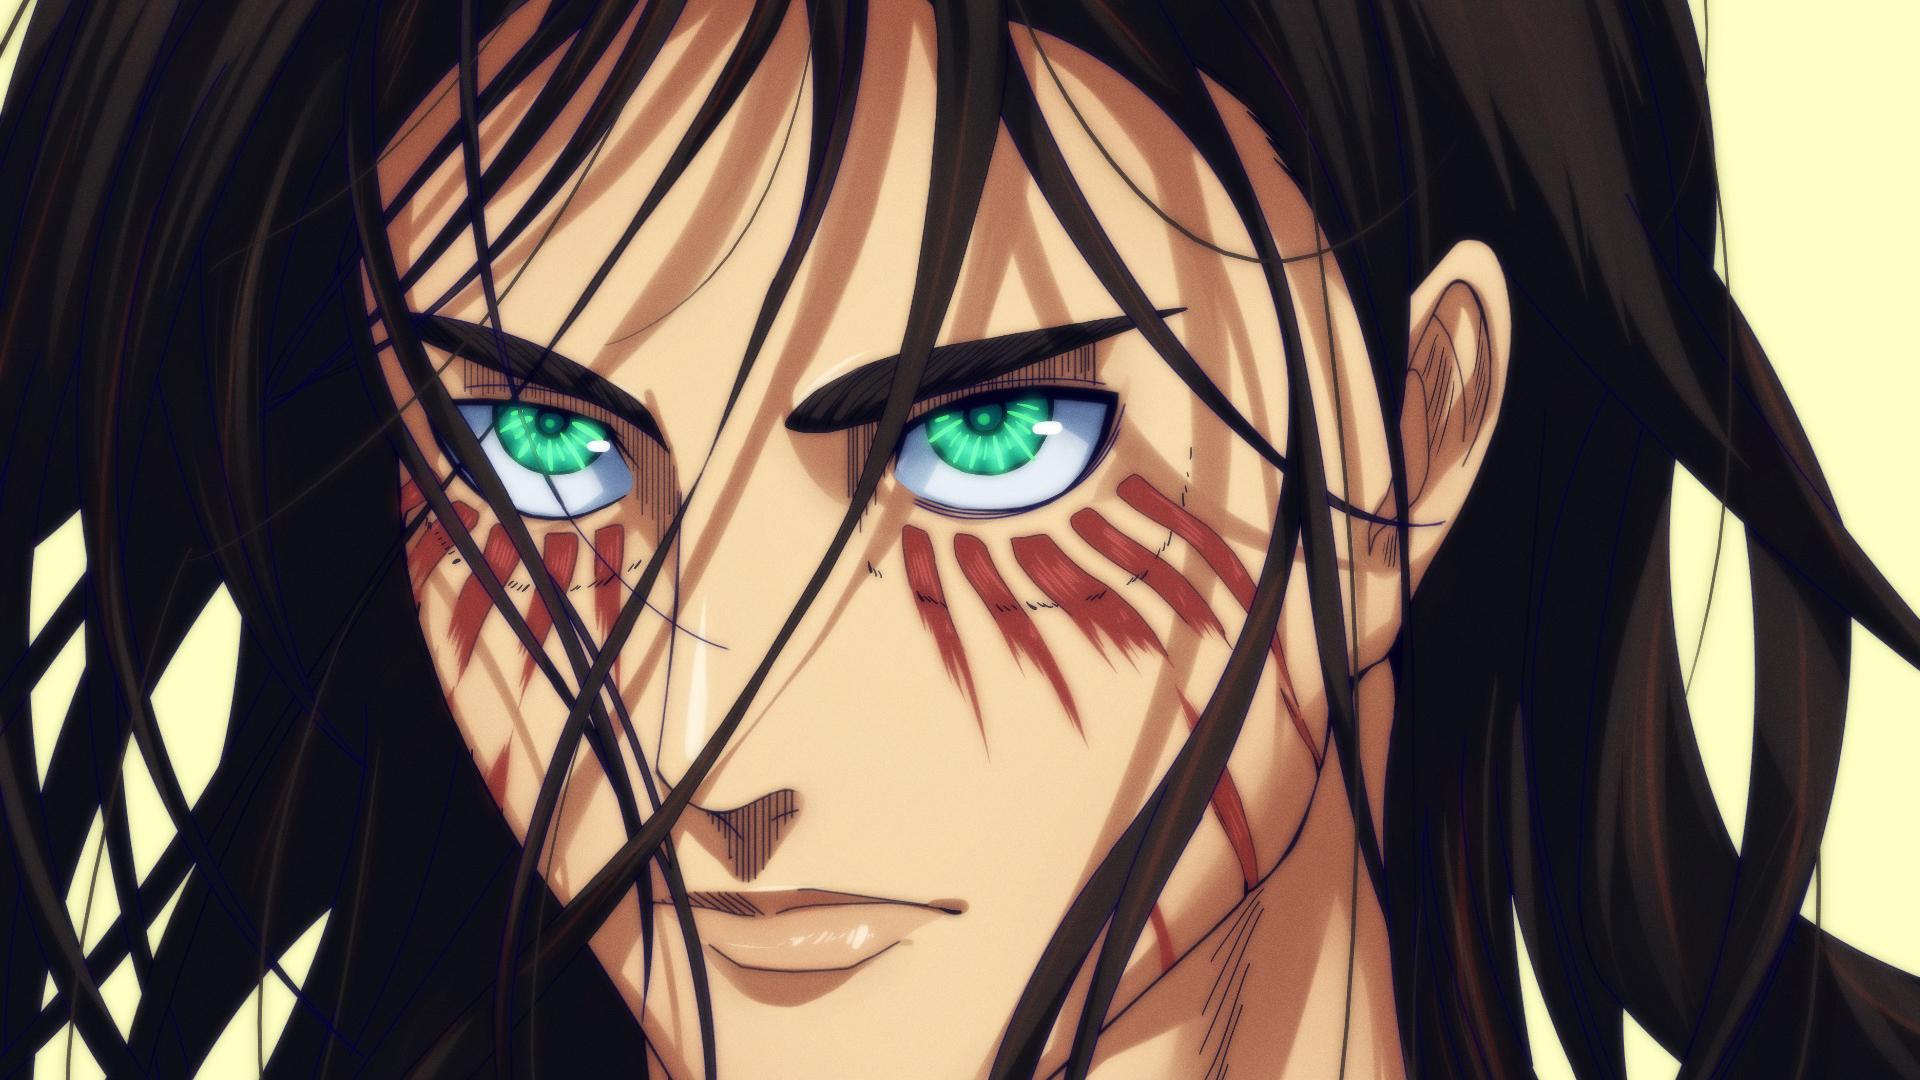 1920x1080 anime attack on titan eren yeager wallpaper. Attack Of Titan Eren Yeager With Green Eyes And Black Hair ...